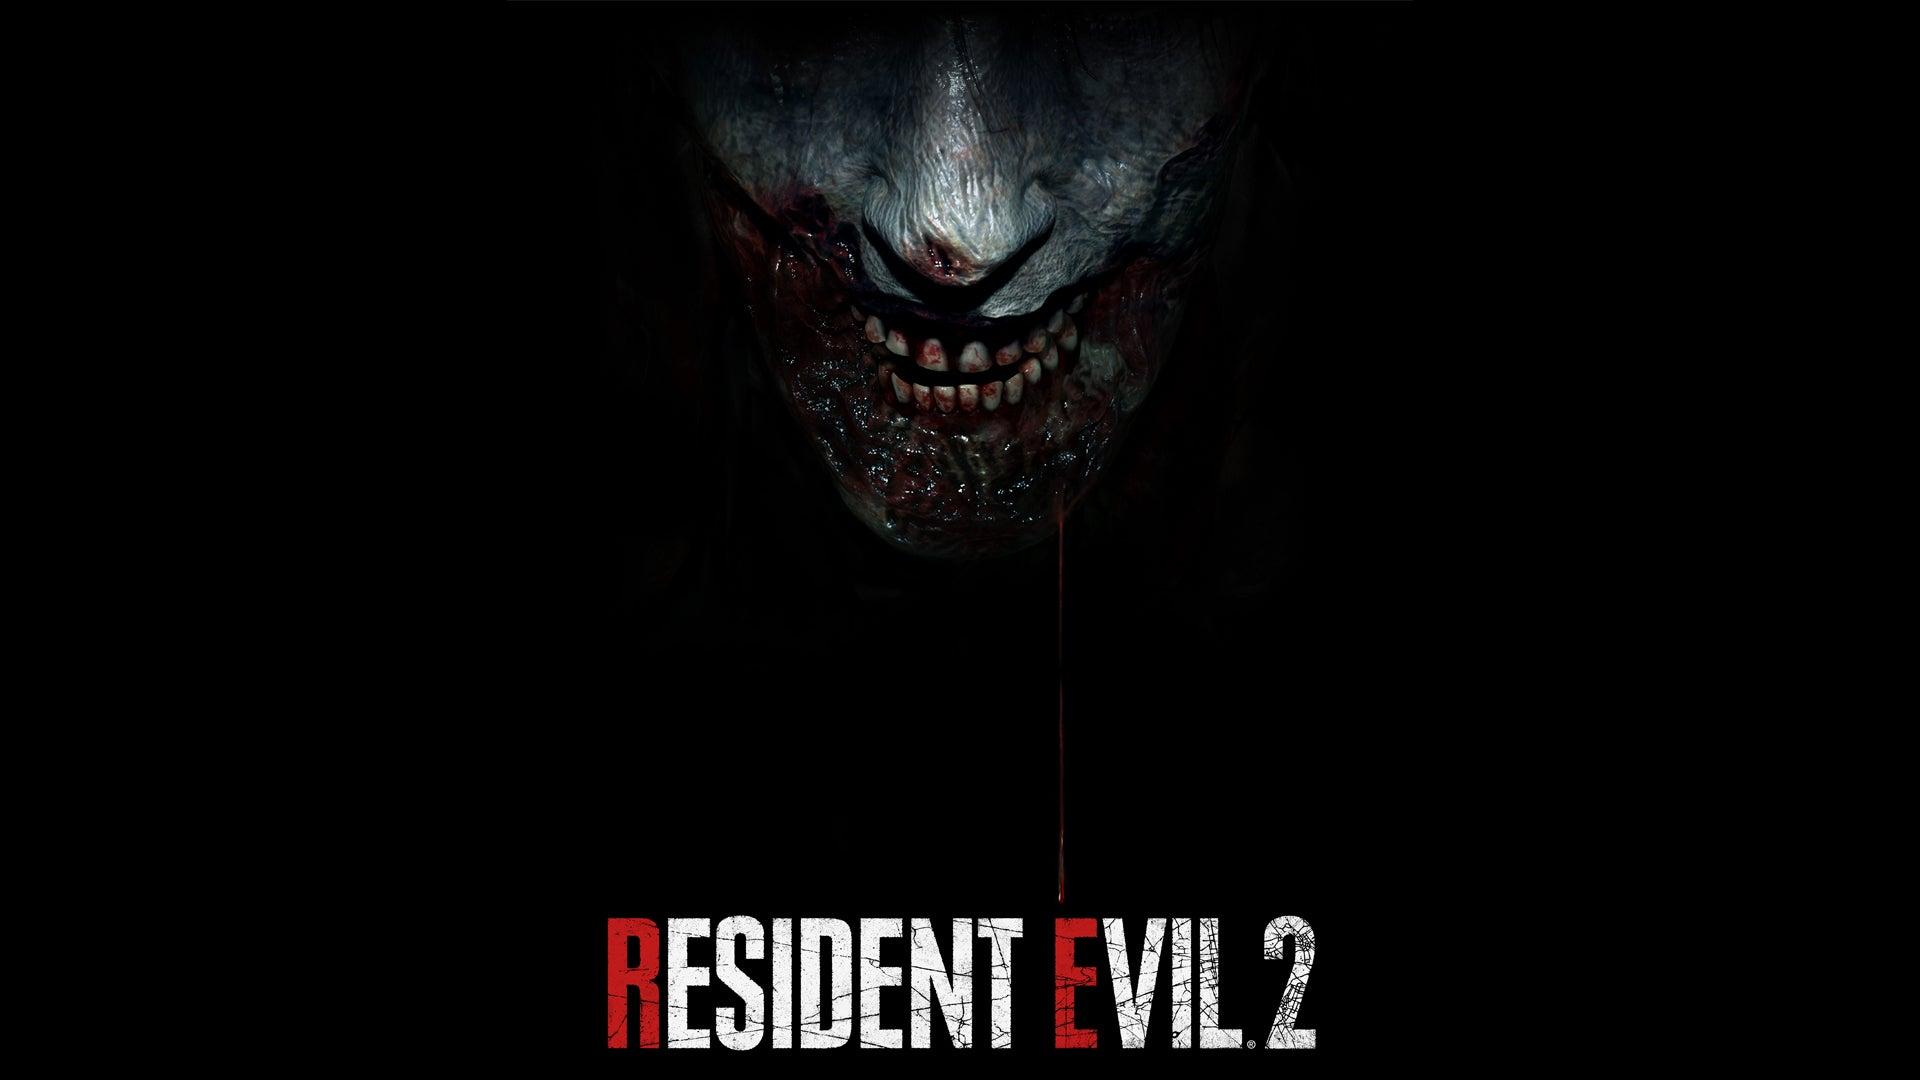 Resident Evil 2 Remake Preview